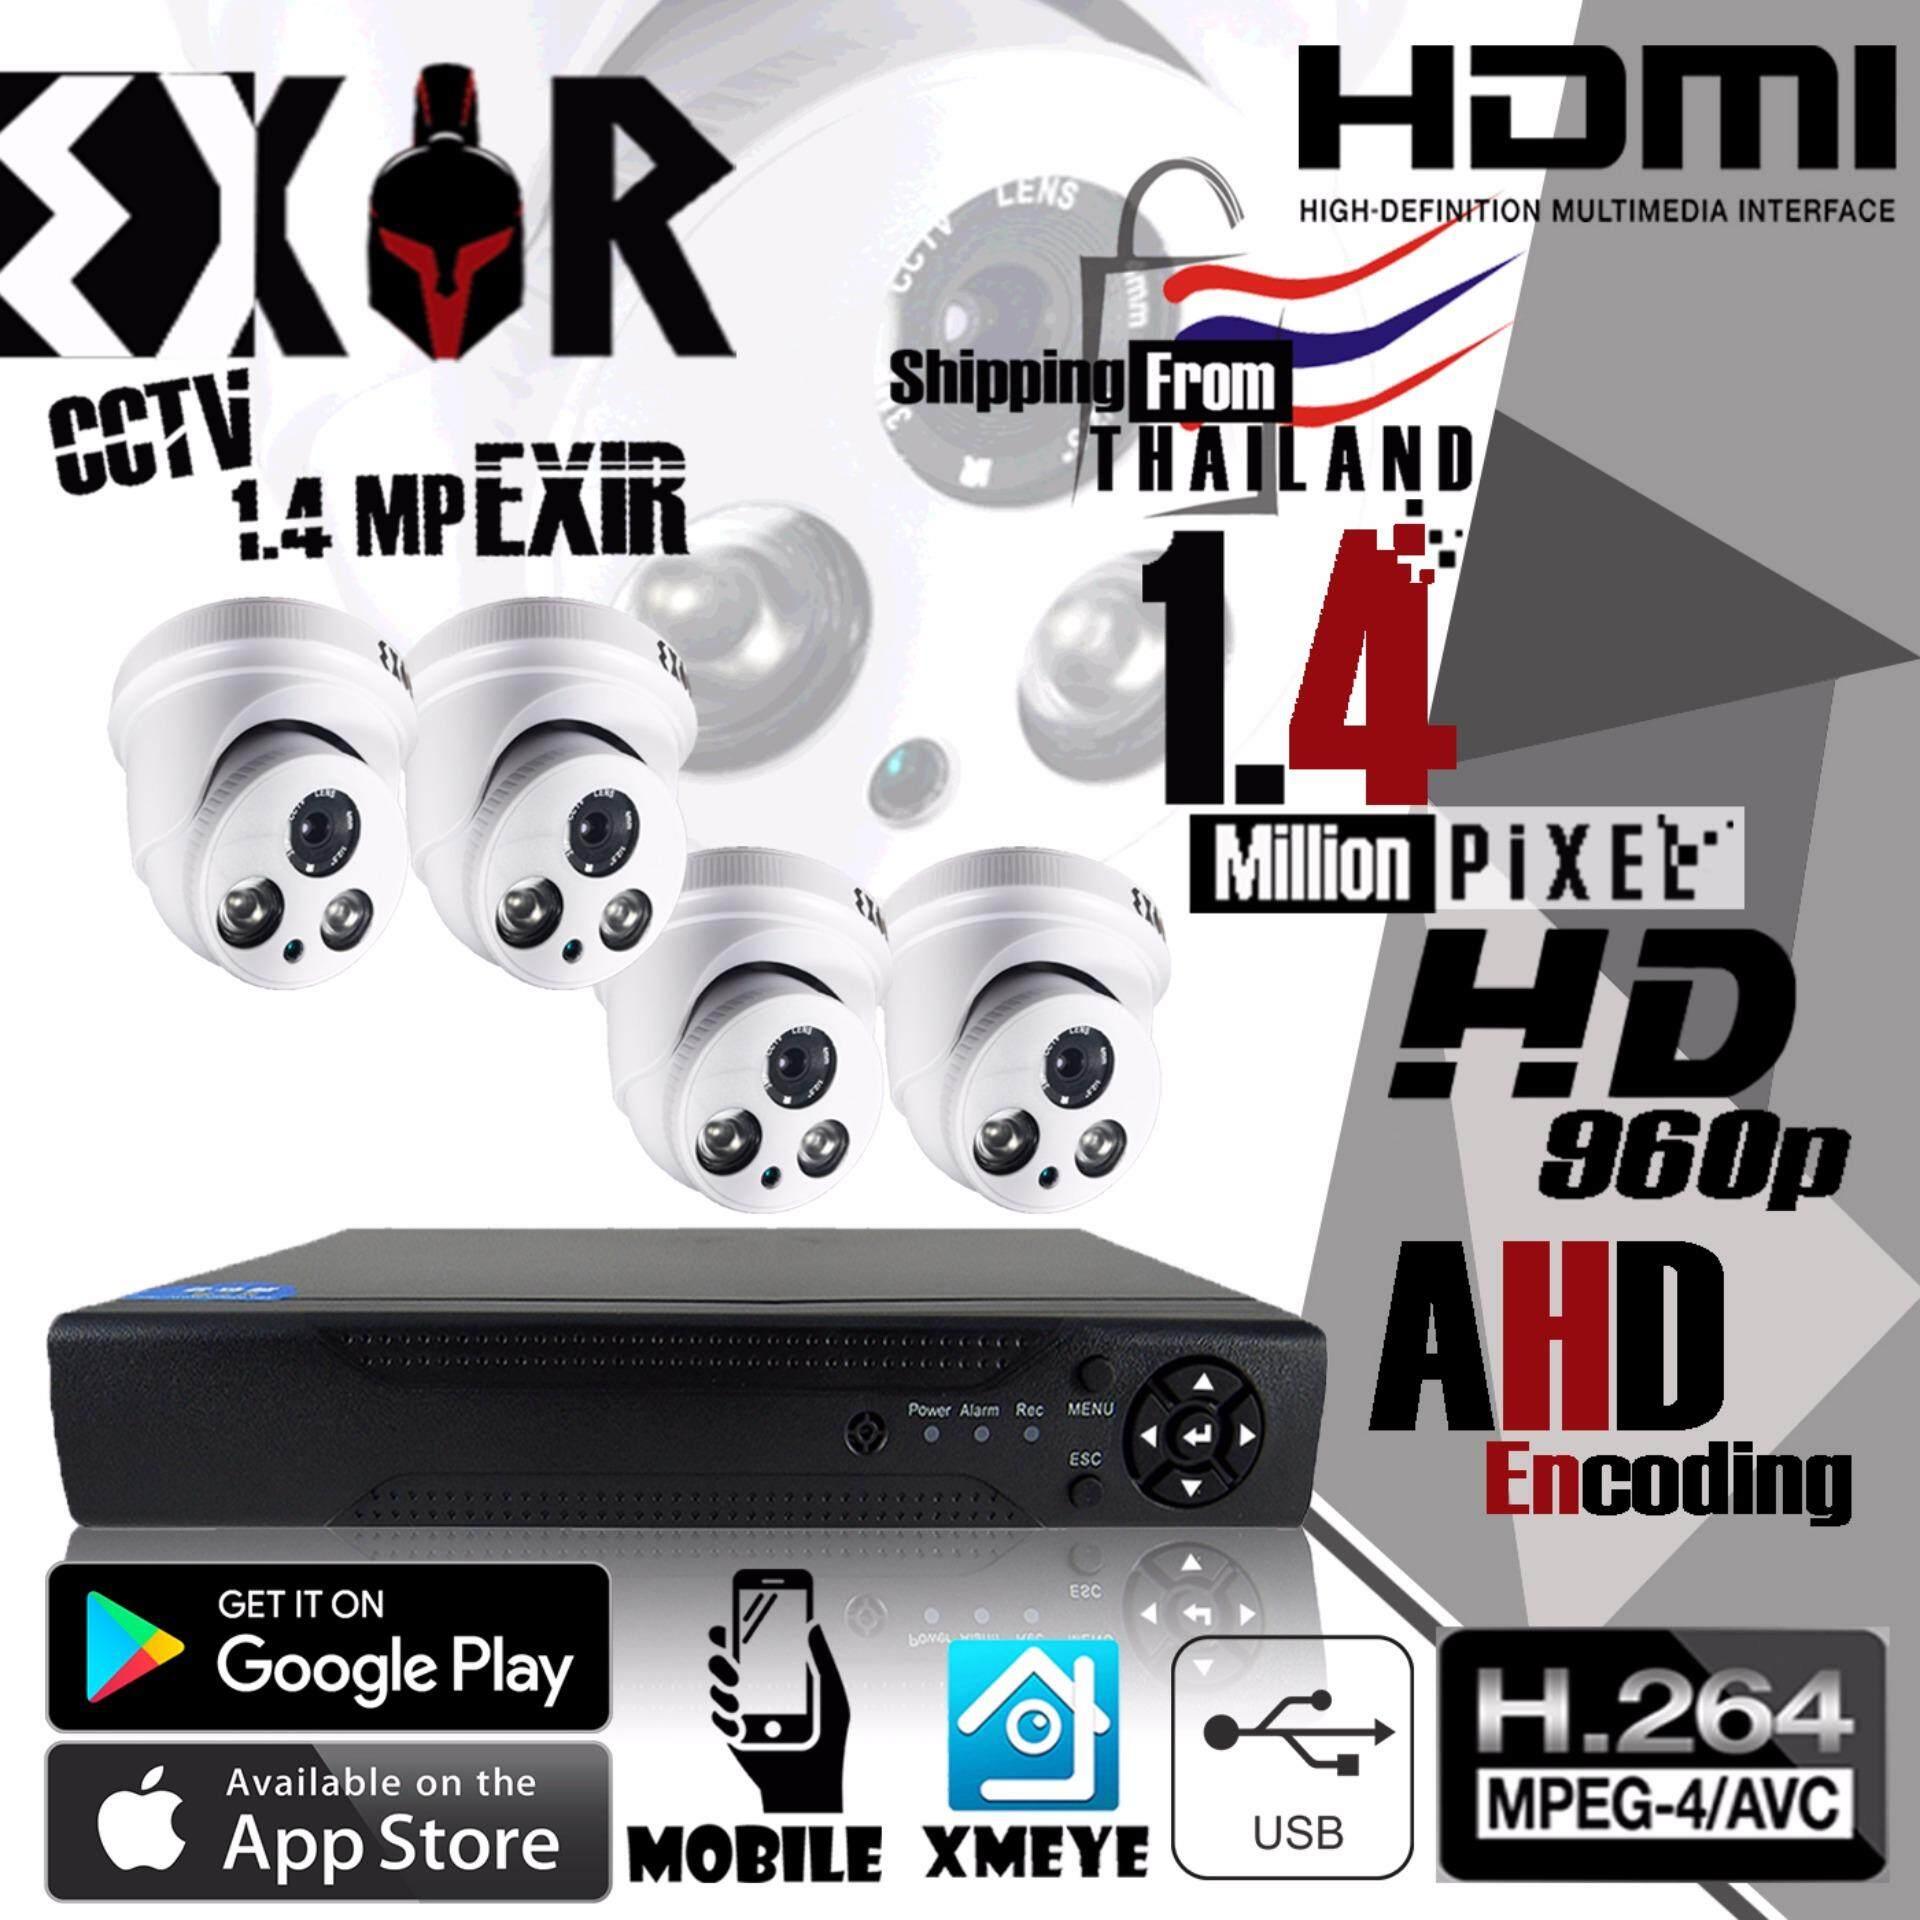 Sale ชุดกล้องวงจรปิด 1.4 MP ล้านพิกเซล ทรงโดม HD 960P เลนส์ 4mm กล้อง 4 ตัว และ เครื่องบันทึกภาพ 4CH DVR Digital Video Recording HD/Full HD ฟรีอะแดปเตอร์ ลดส่งท้ายปี